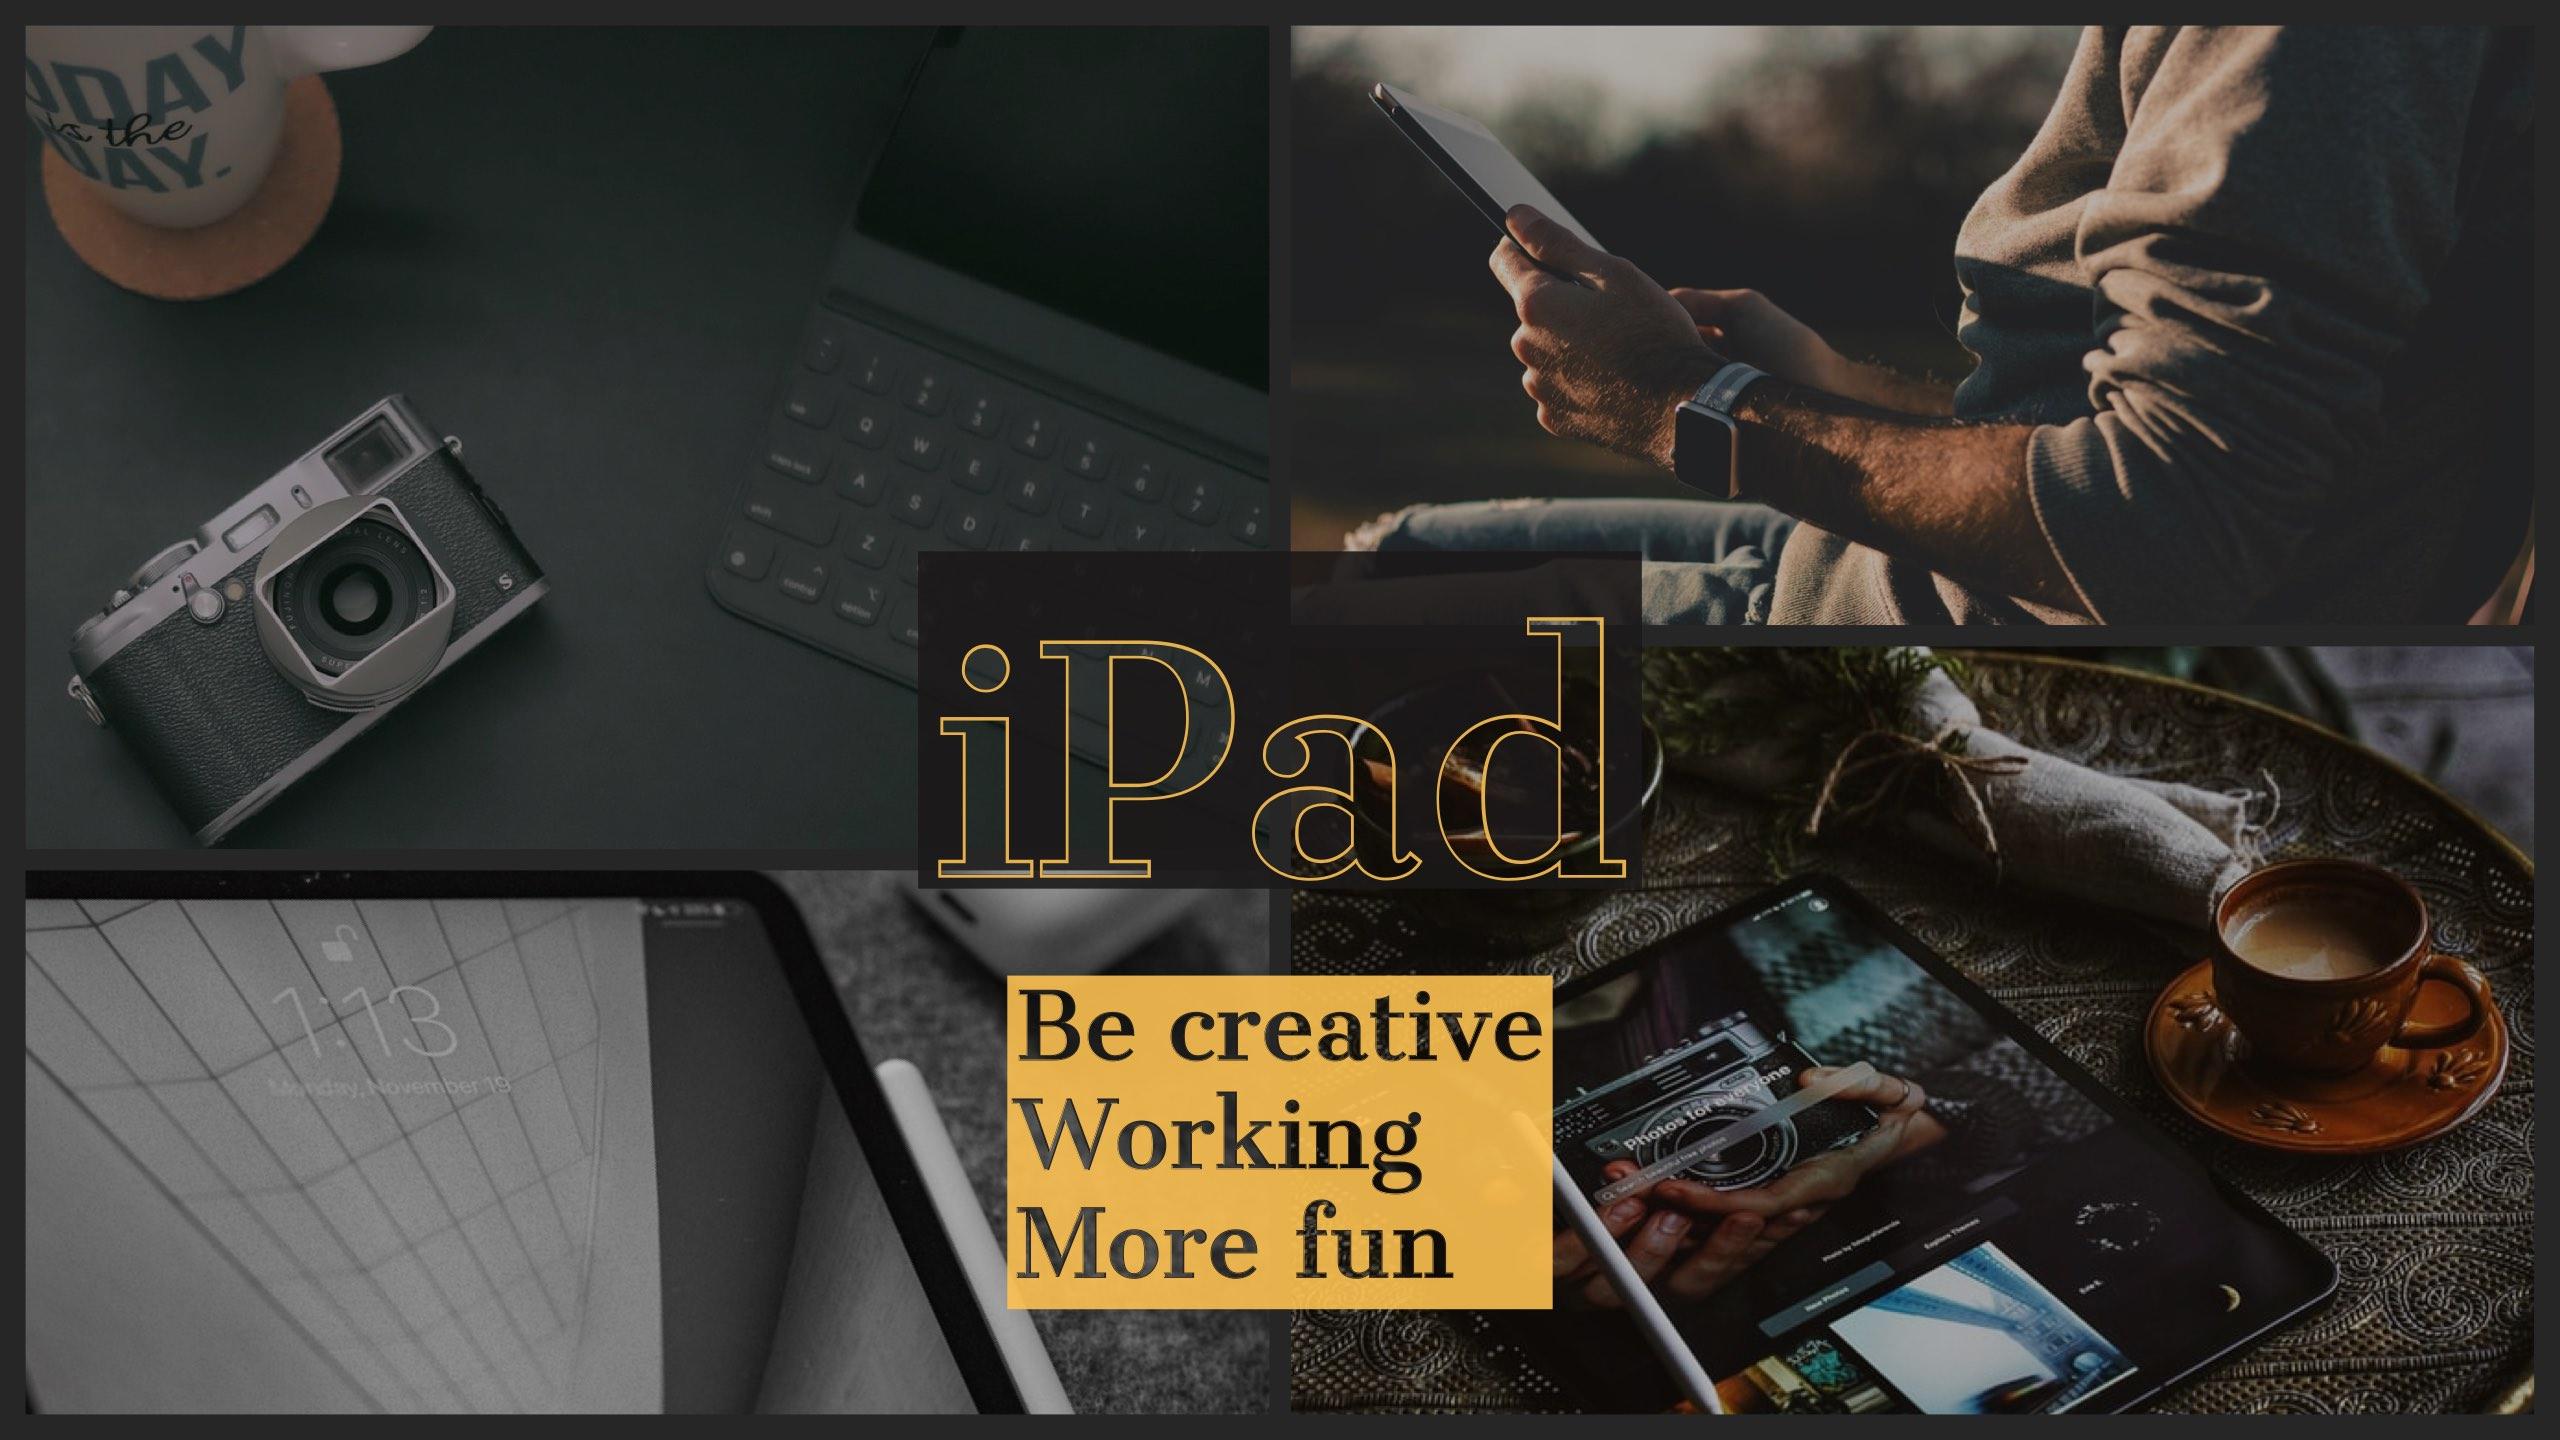 【iPad不要説】iPadは使い道がないのか?できることを徹底検証!